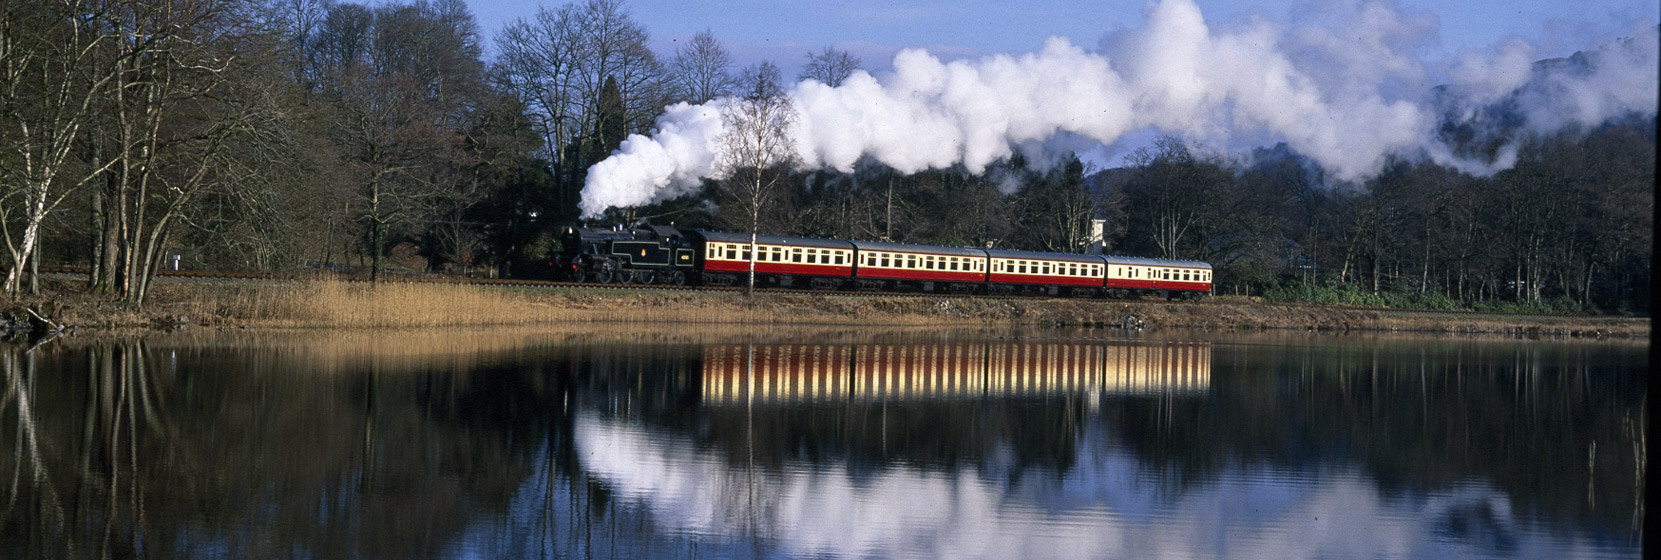 Lakeside Haverthwaite railway